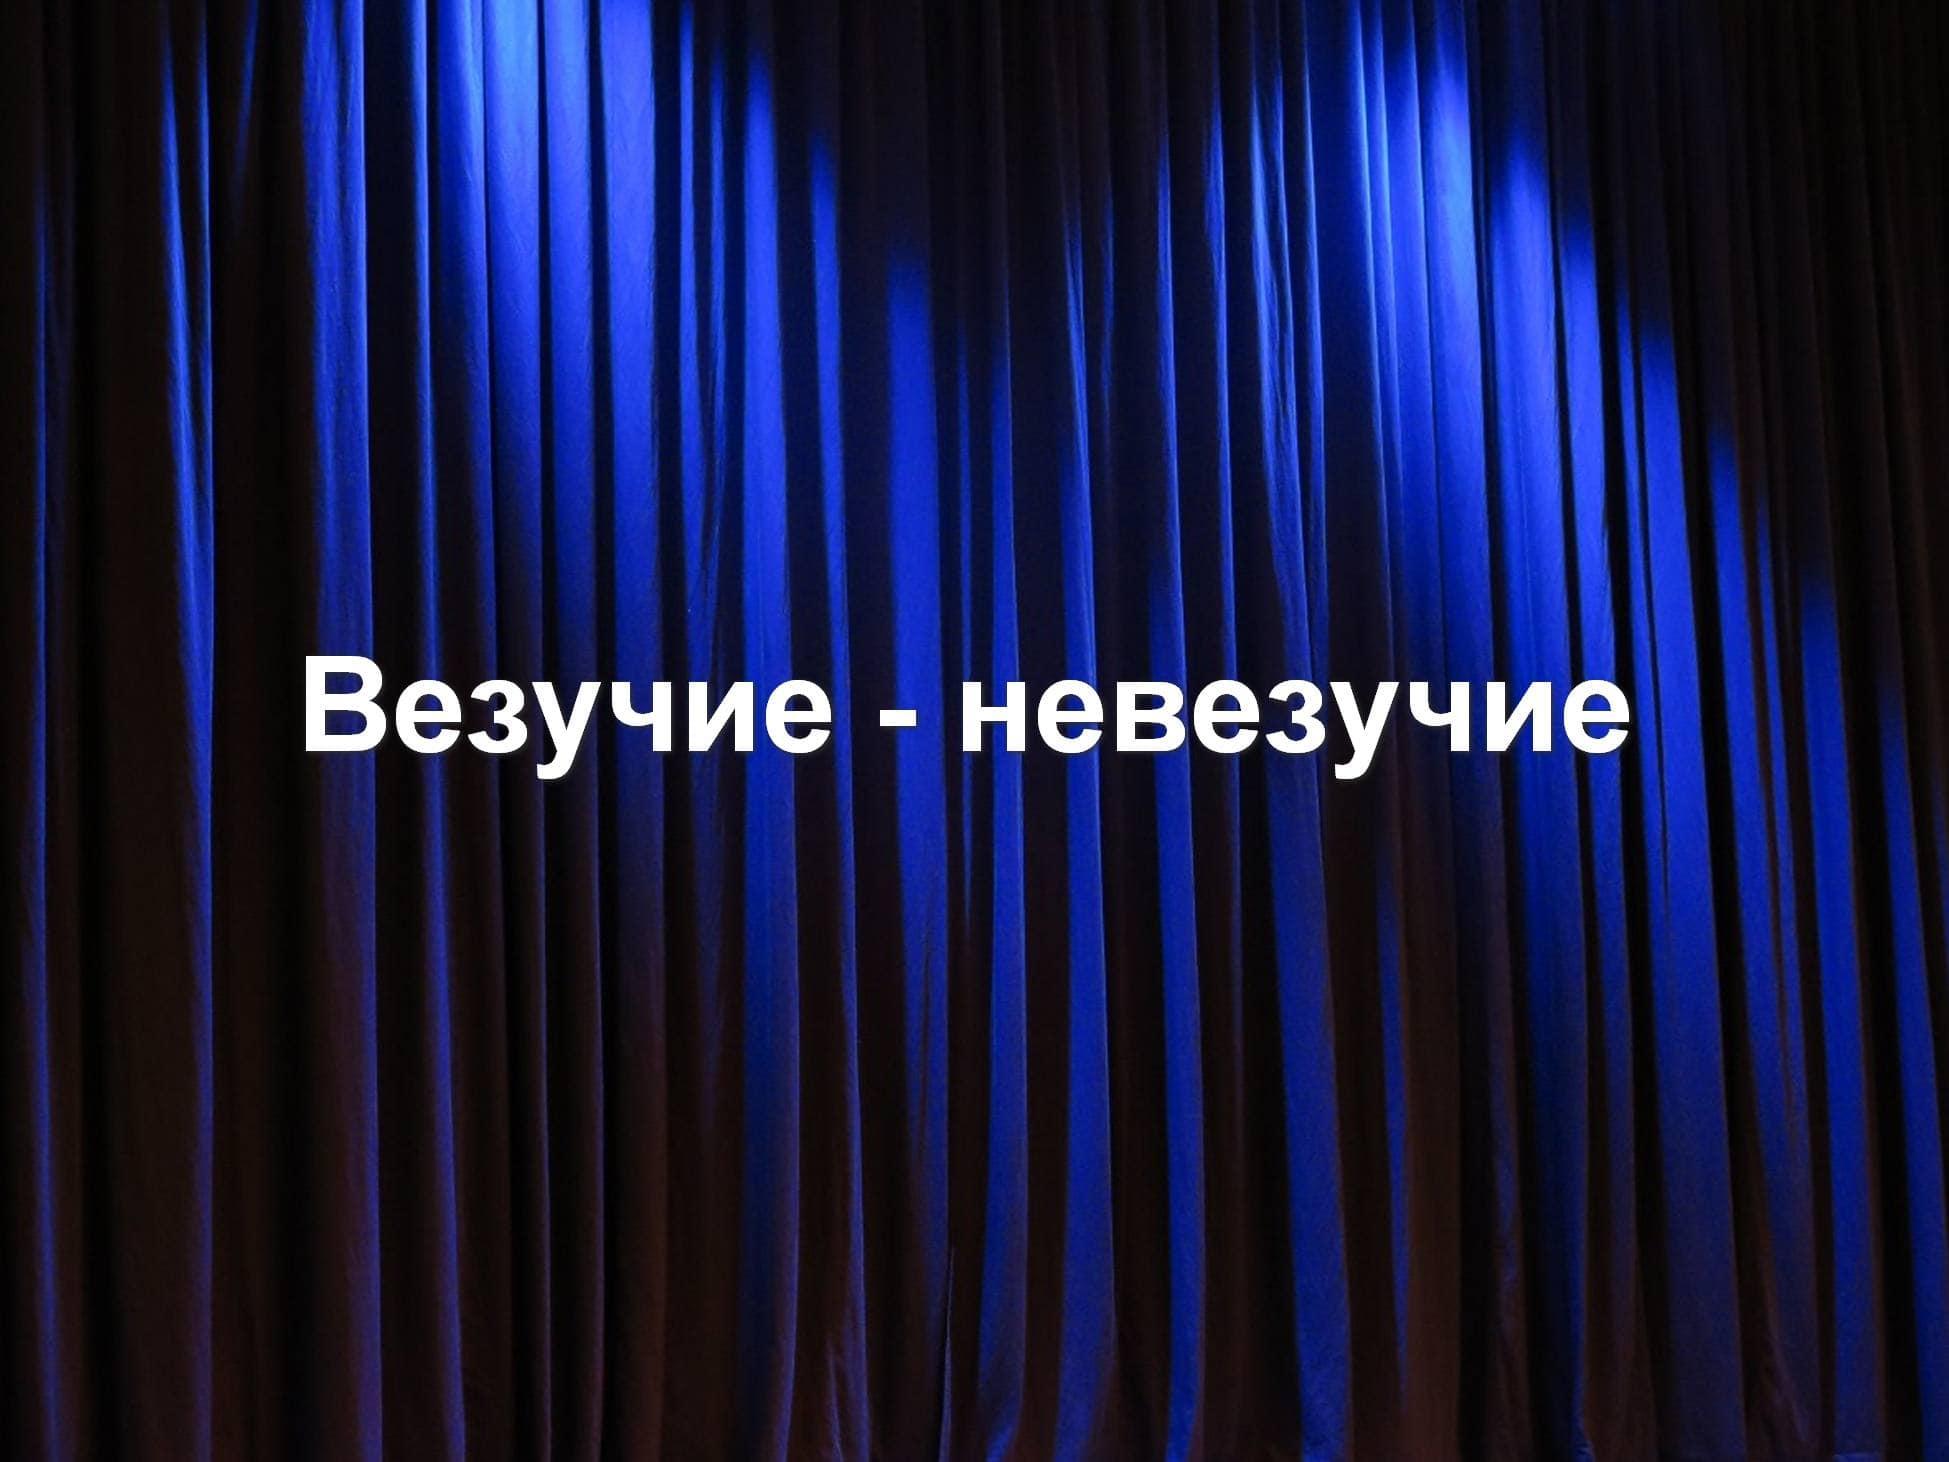 программа Калейдоскоп ТВ: Везучие невезучие